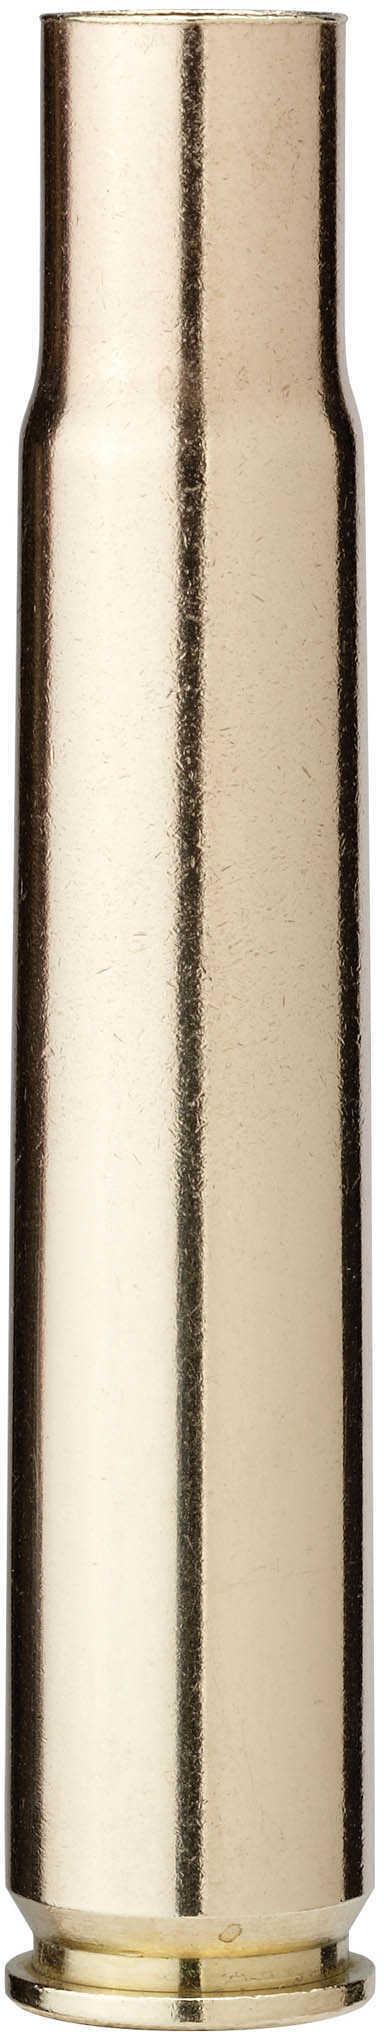 Unprimed Brass By Hornady 35 Whelen (Per 50) Md: 87291